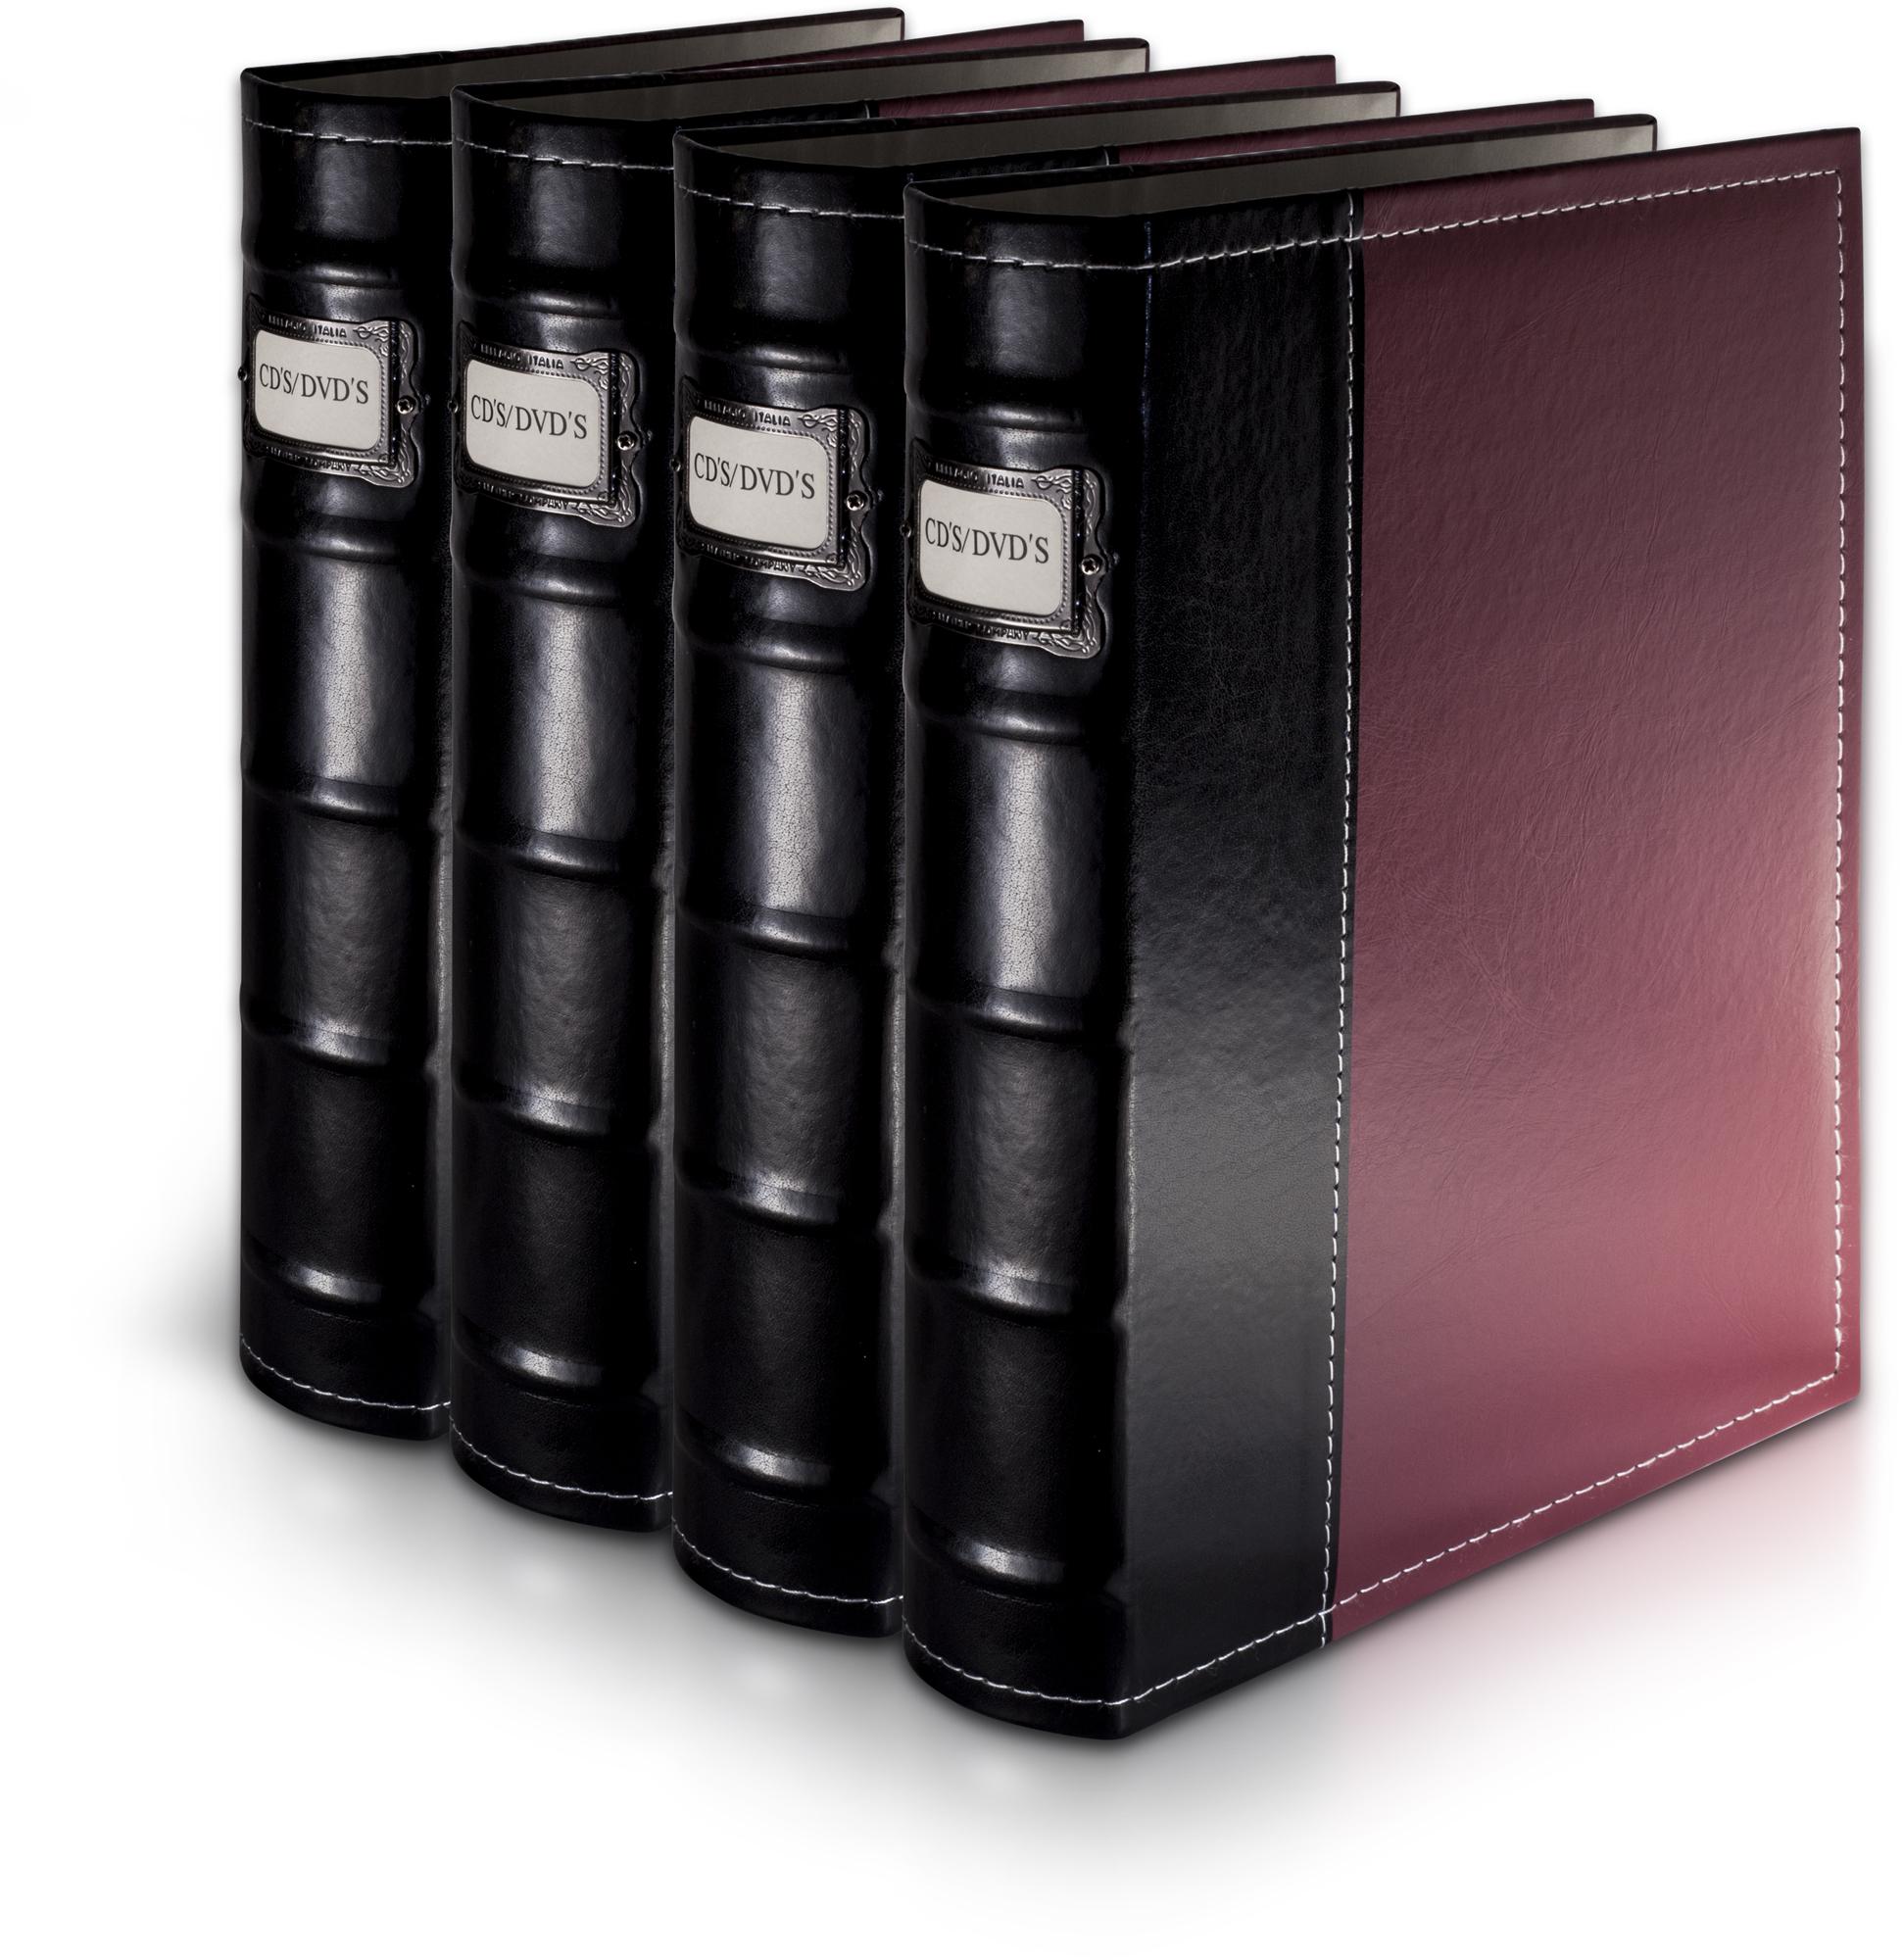 Bellagio-Italia Burgandy Leather CD/DVD Binder 4 Pack